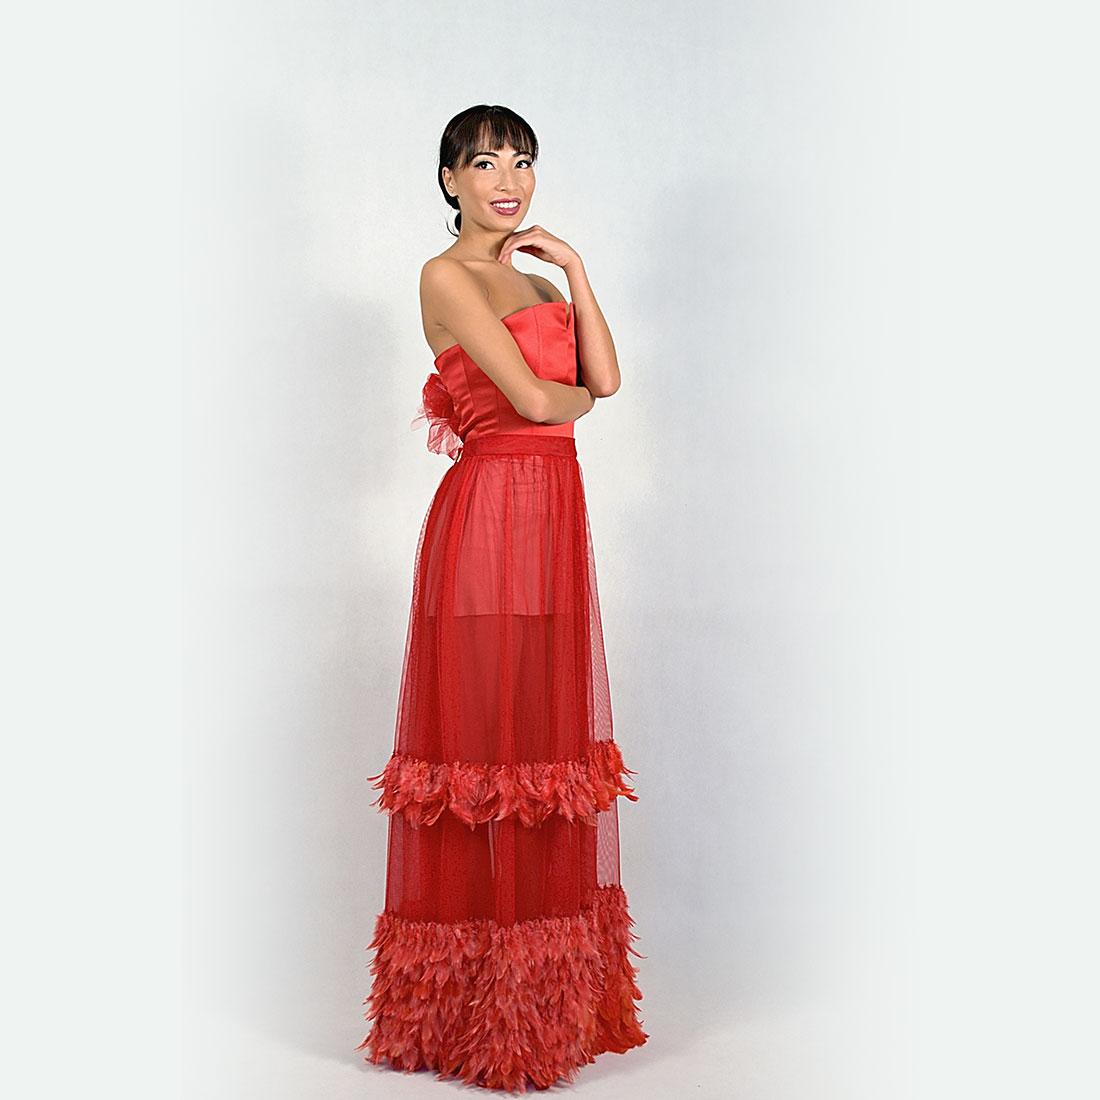 04767892bac9 Dvojdielne červené šaty s korzetom a tylovou sukňou